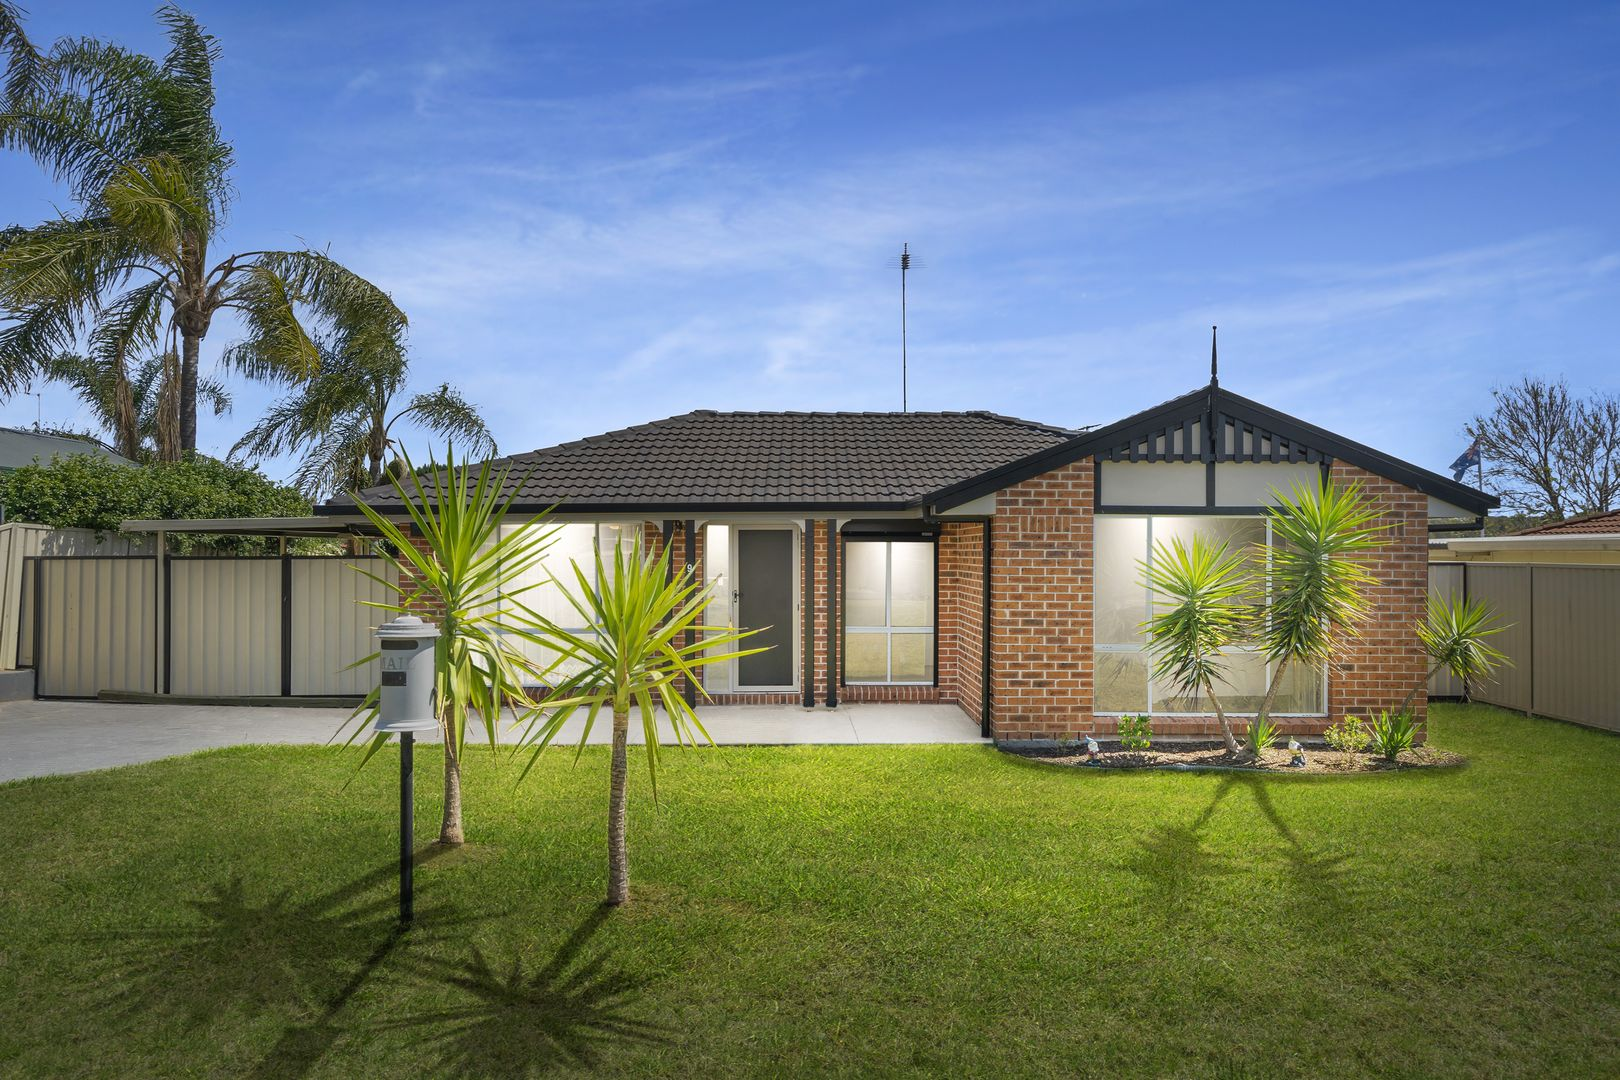 9 Sandpiper Crescent, Claremont Meadows NSW 2747, Image 0